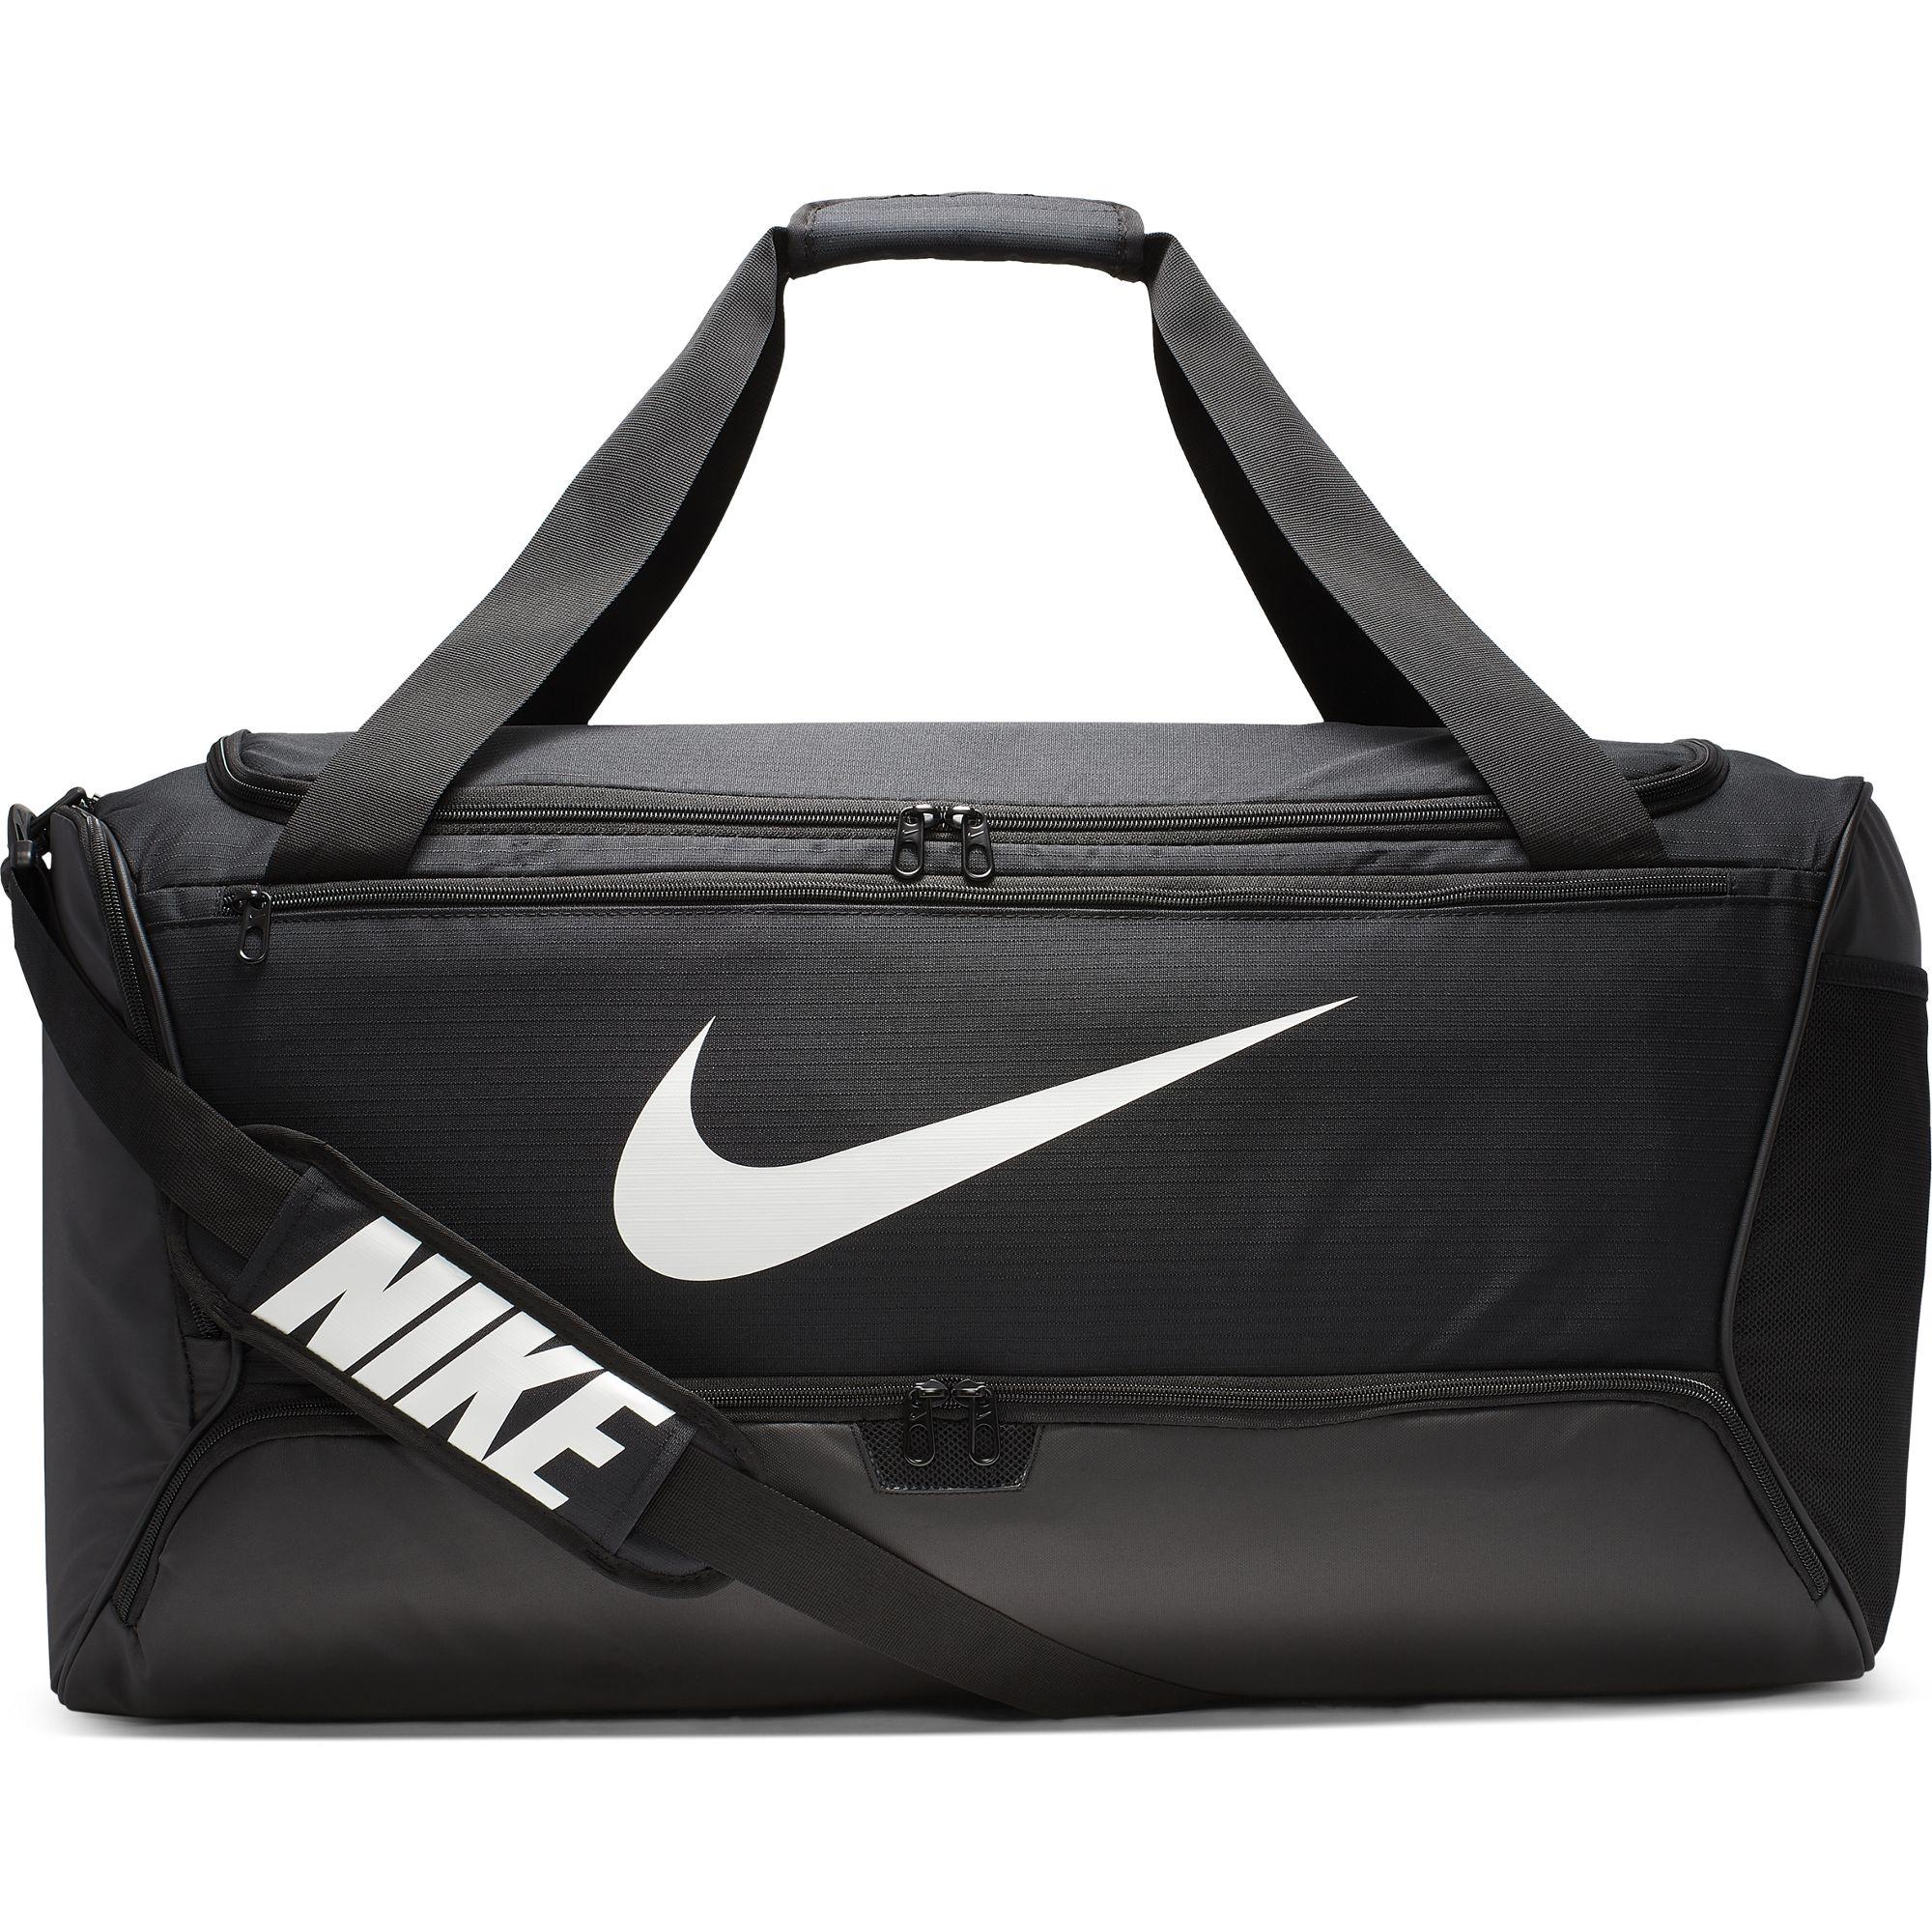 Brasilia Large Duffel Bag, Black/Black, swatch